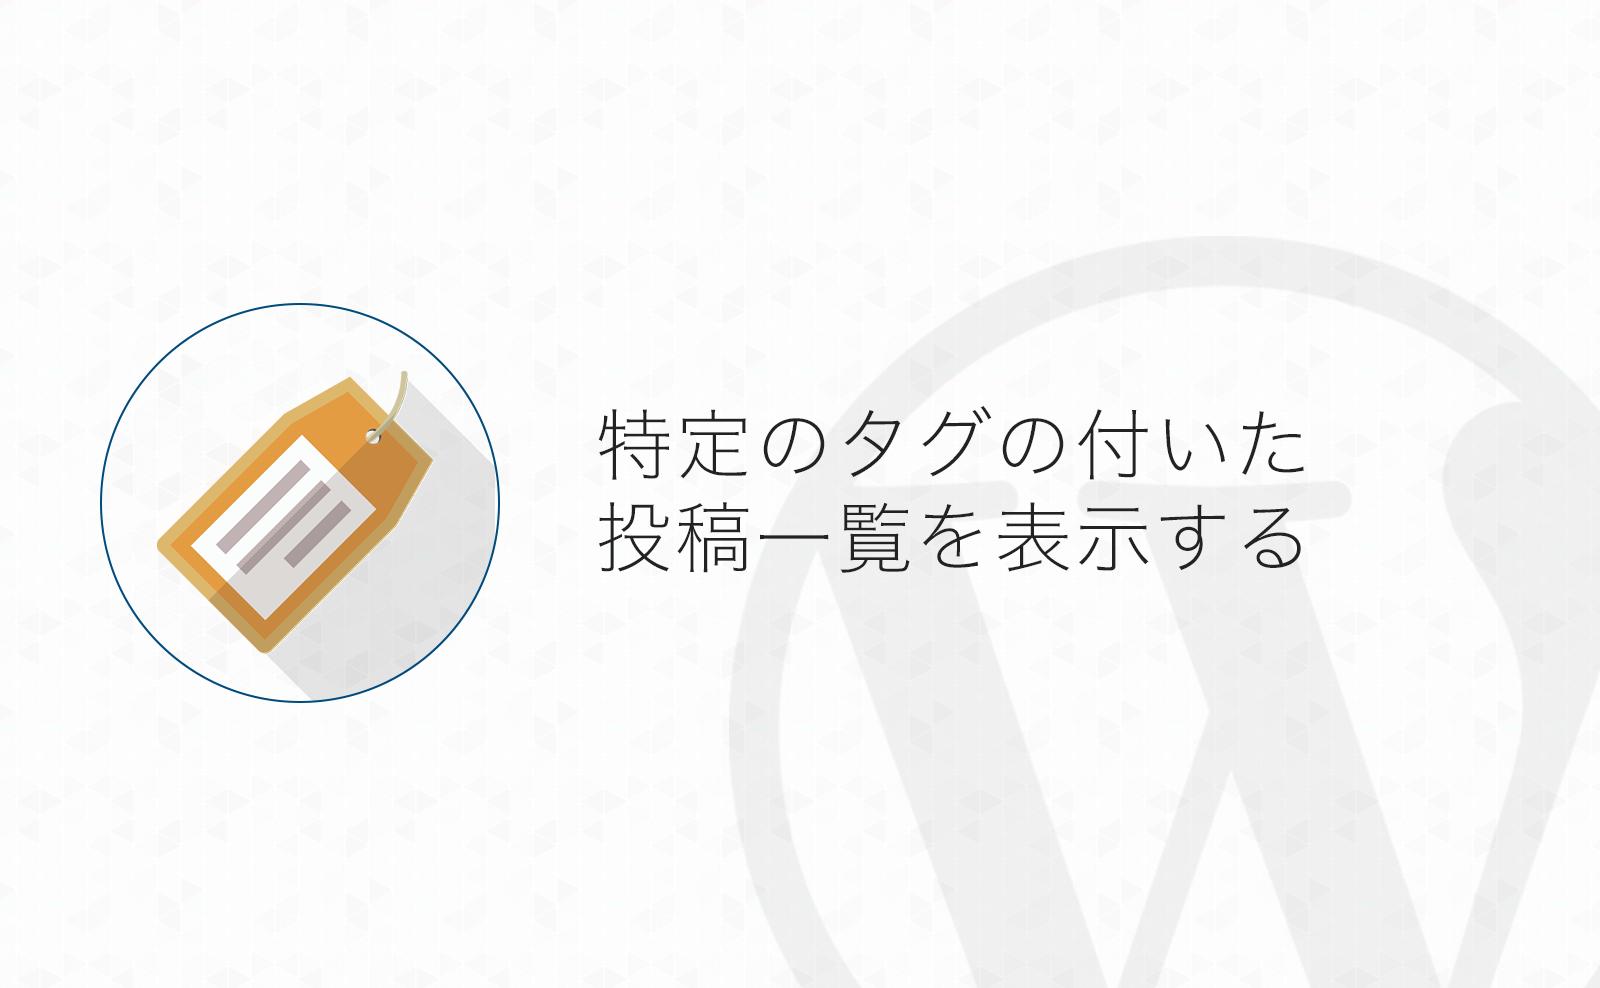 【WordPress】特定のタグで絞り込んだ記事の一覧を表示させる方法